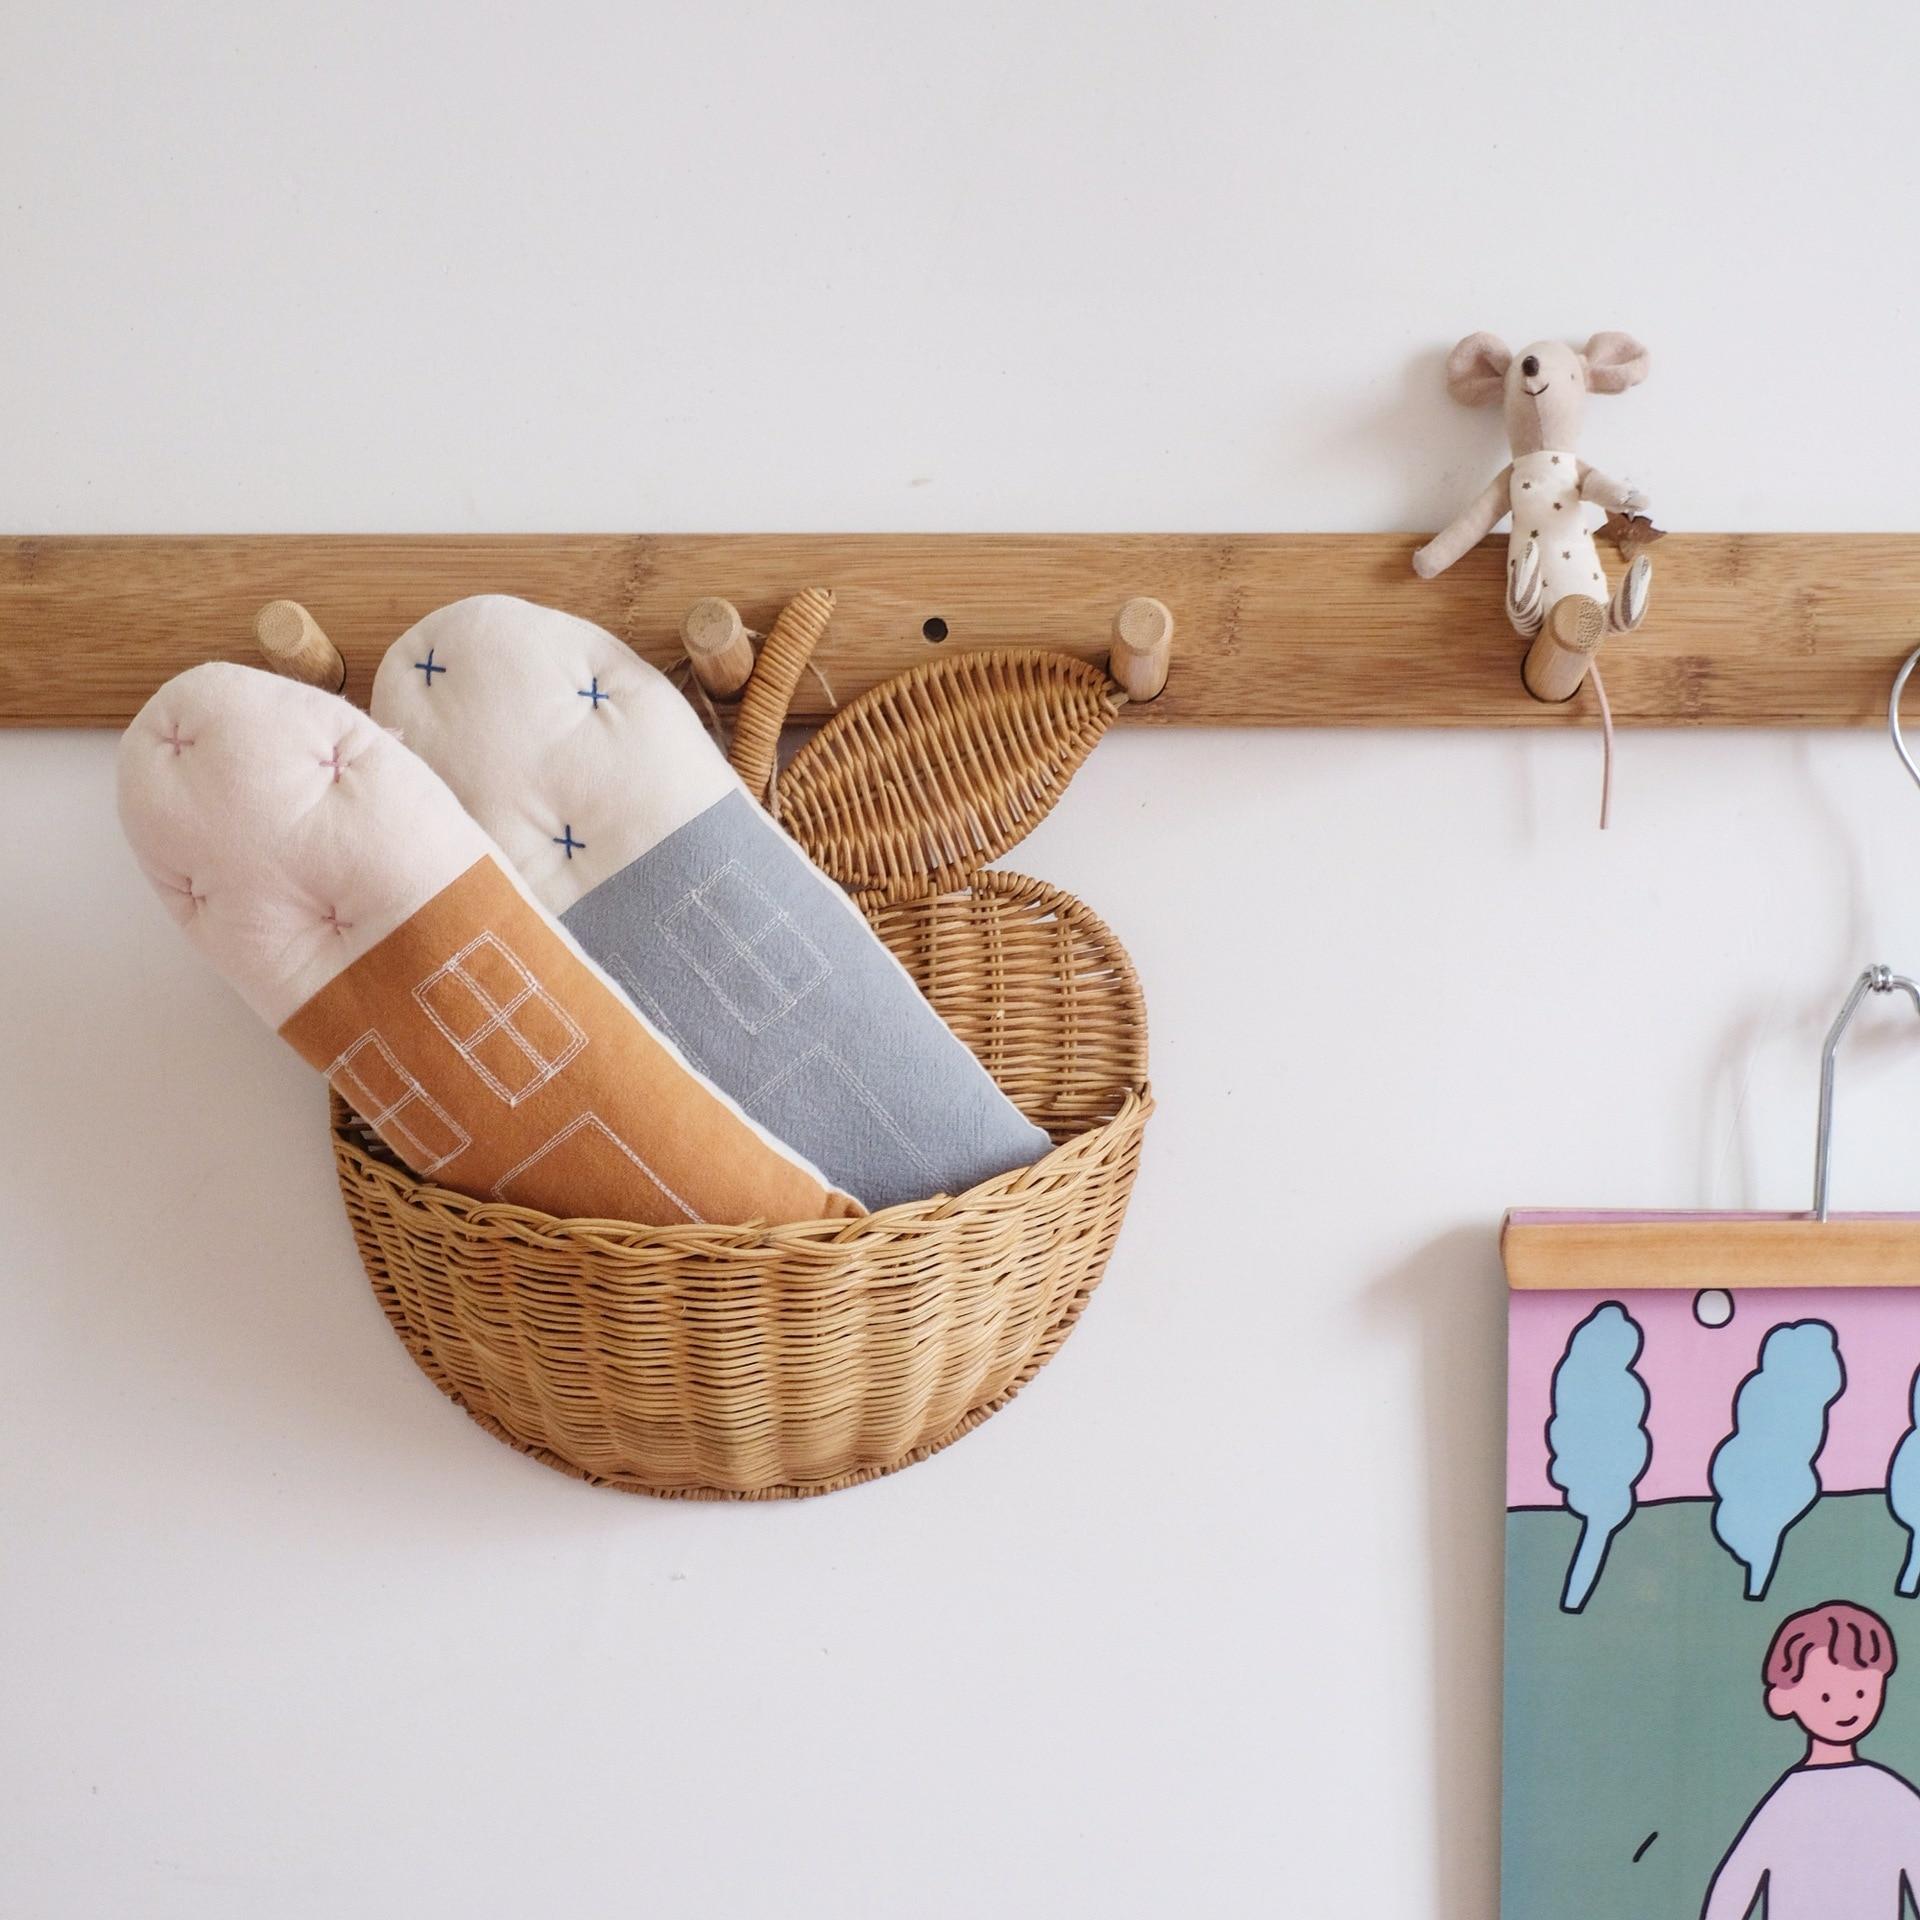 Nordic Style Handmade Rattan Apple Shape Wall Storage Basket Kids Room Wicker Organizer Neatening Nursery Wall Decoration Shelf